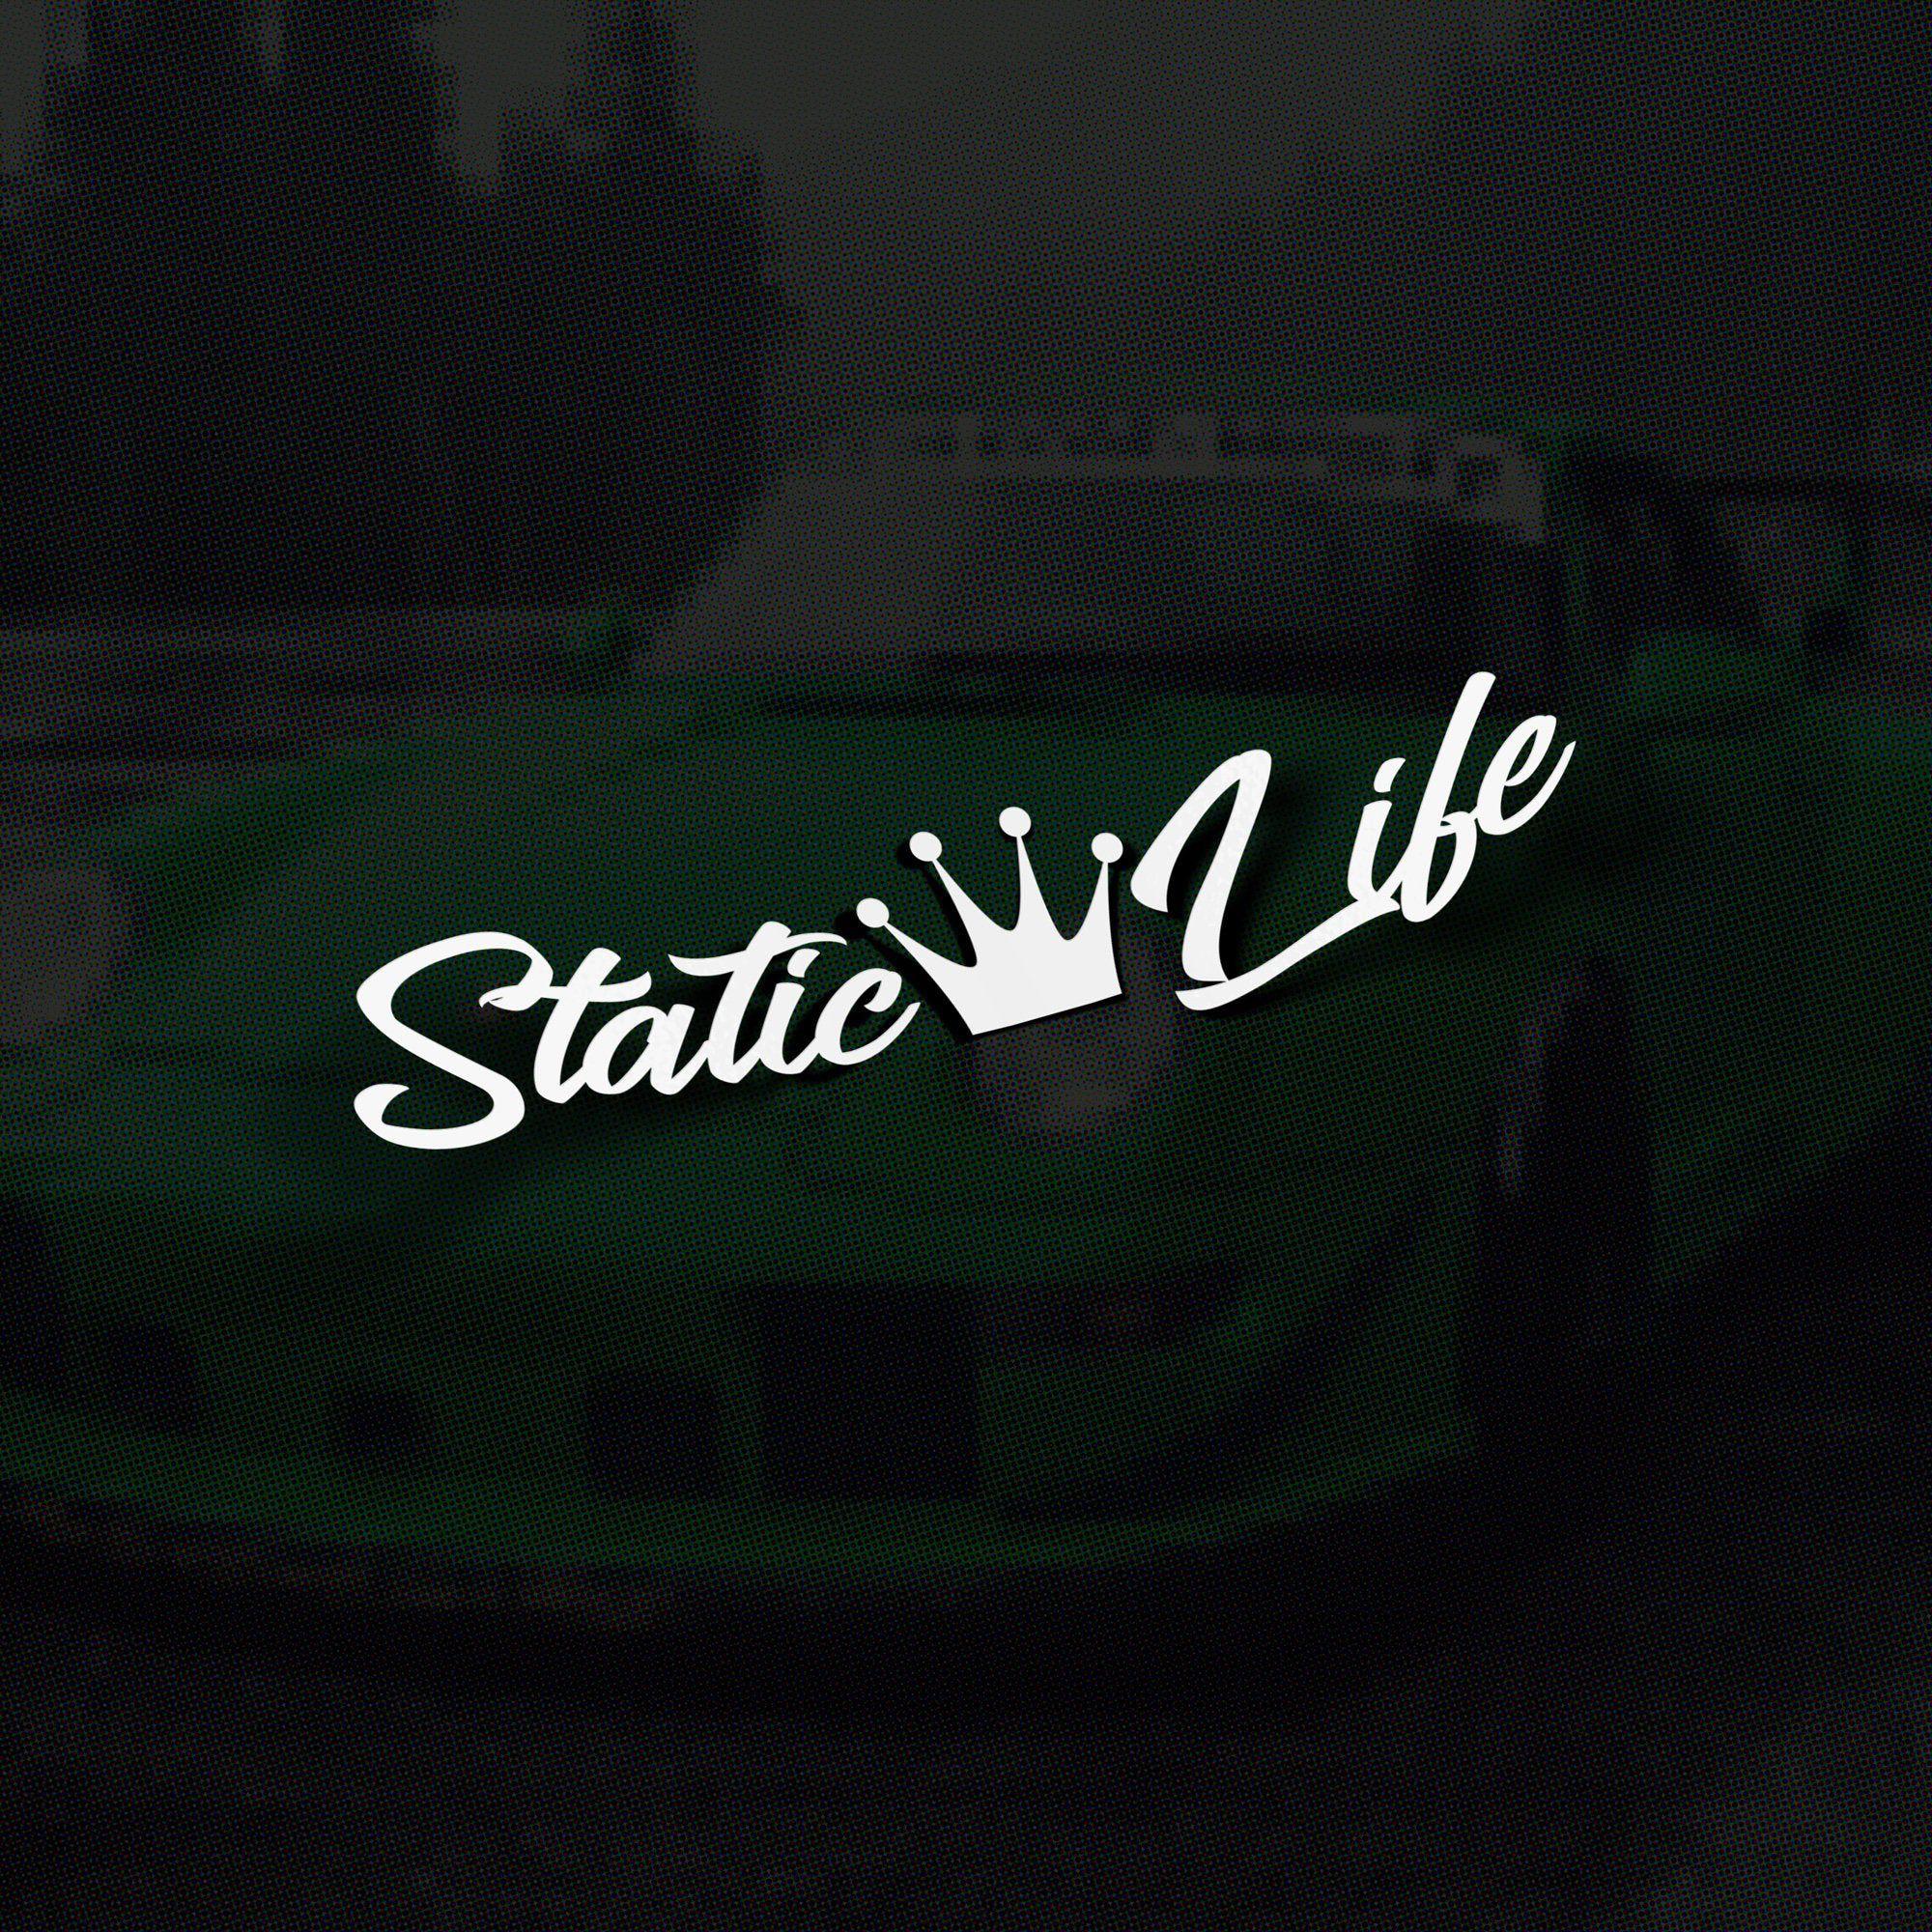 Static Life Jdm Wave Tuner Car Vinyl Drift Anime Decal Sticker Etsy Anime Decals Vinyl Transfer Tape [ 2000 x 2000 Pixel ]